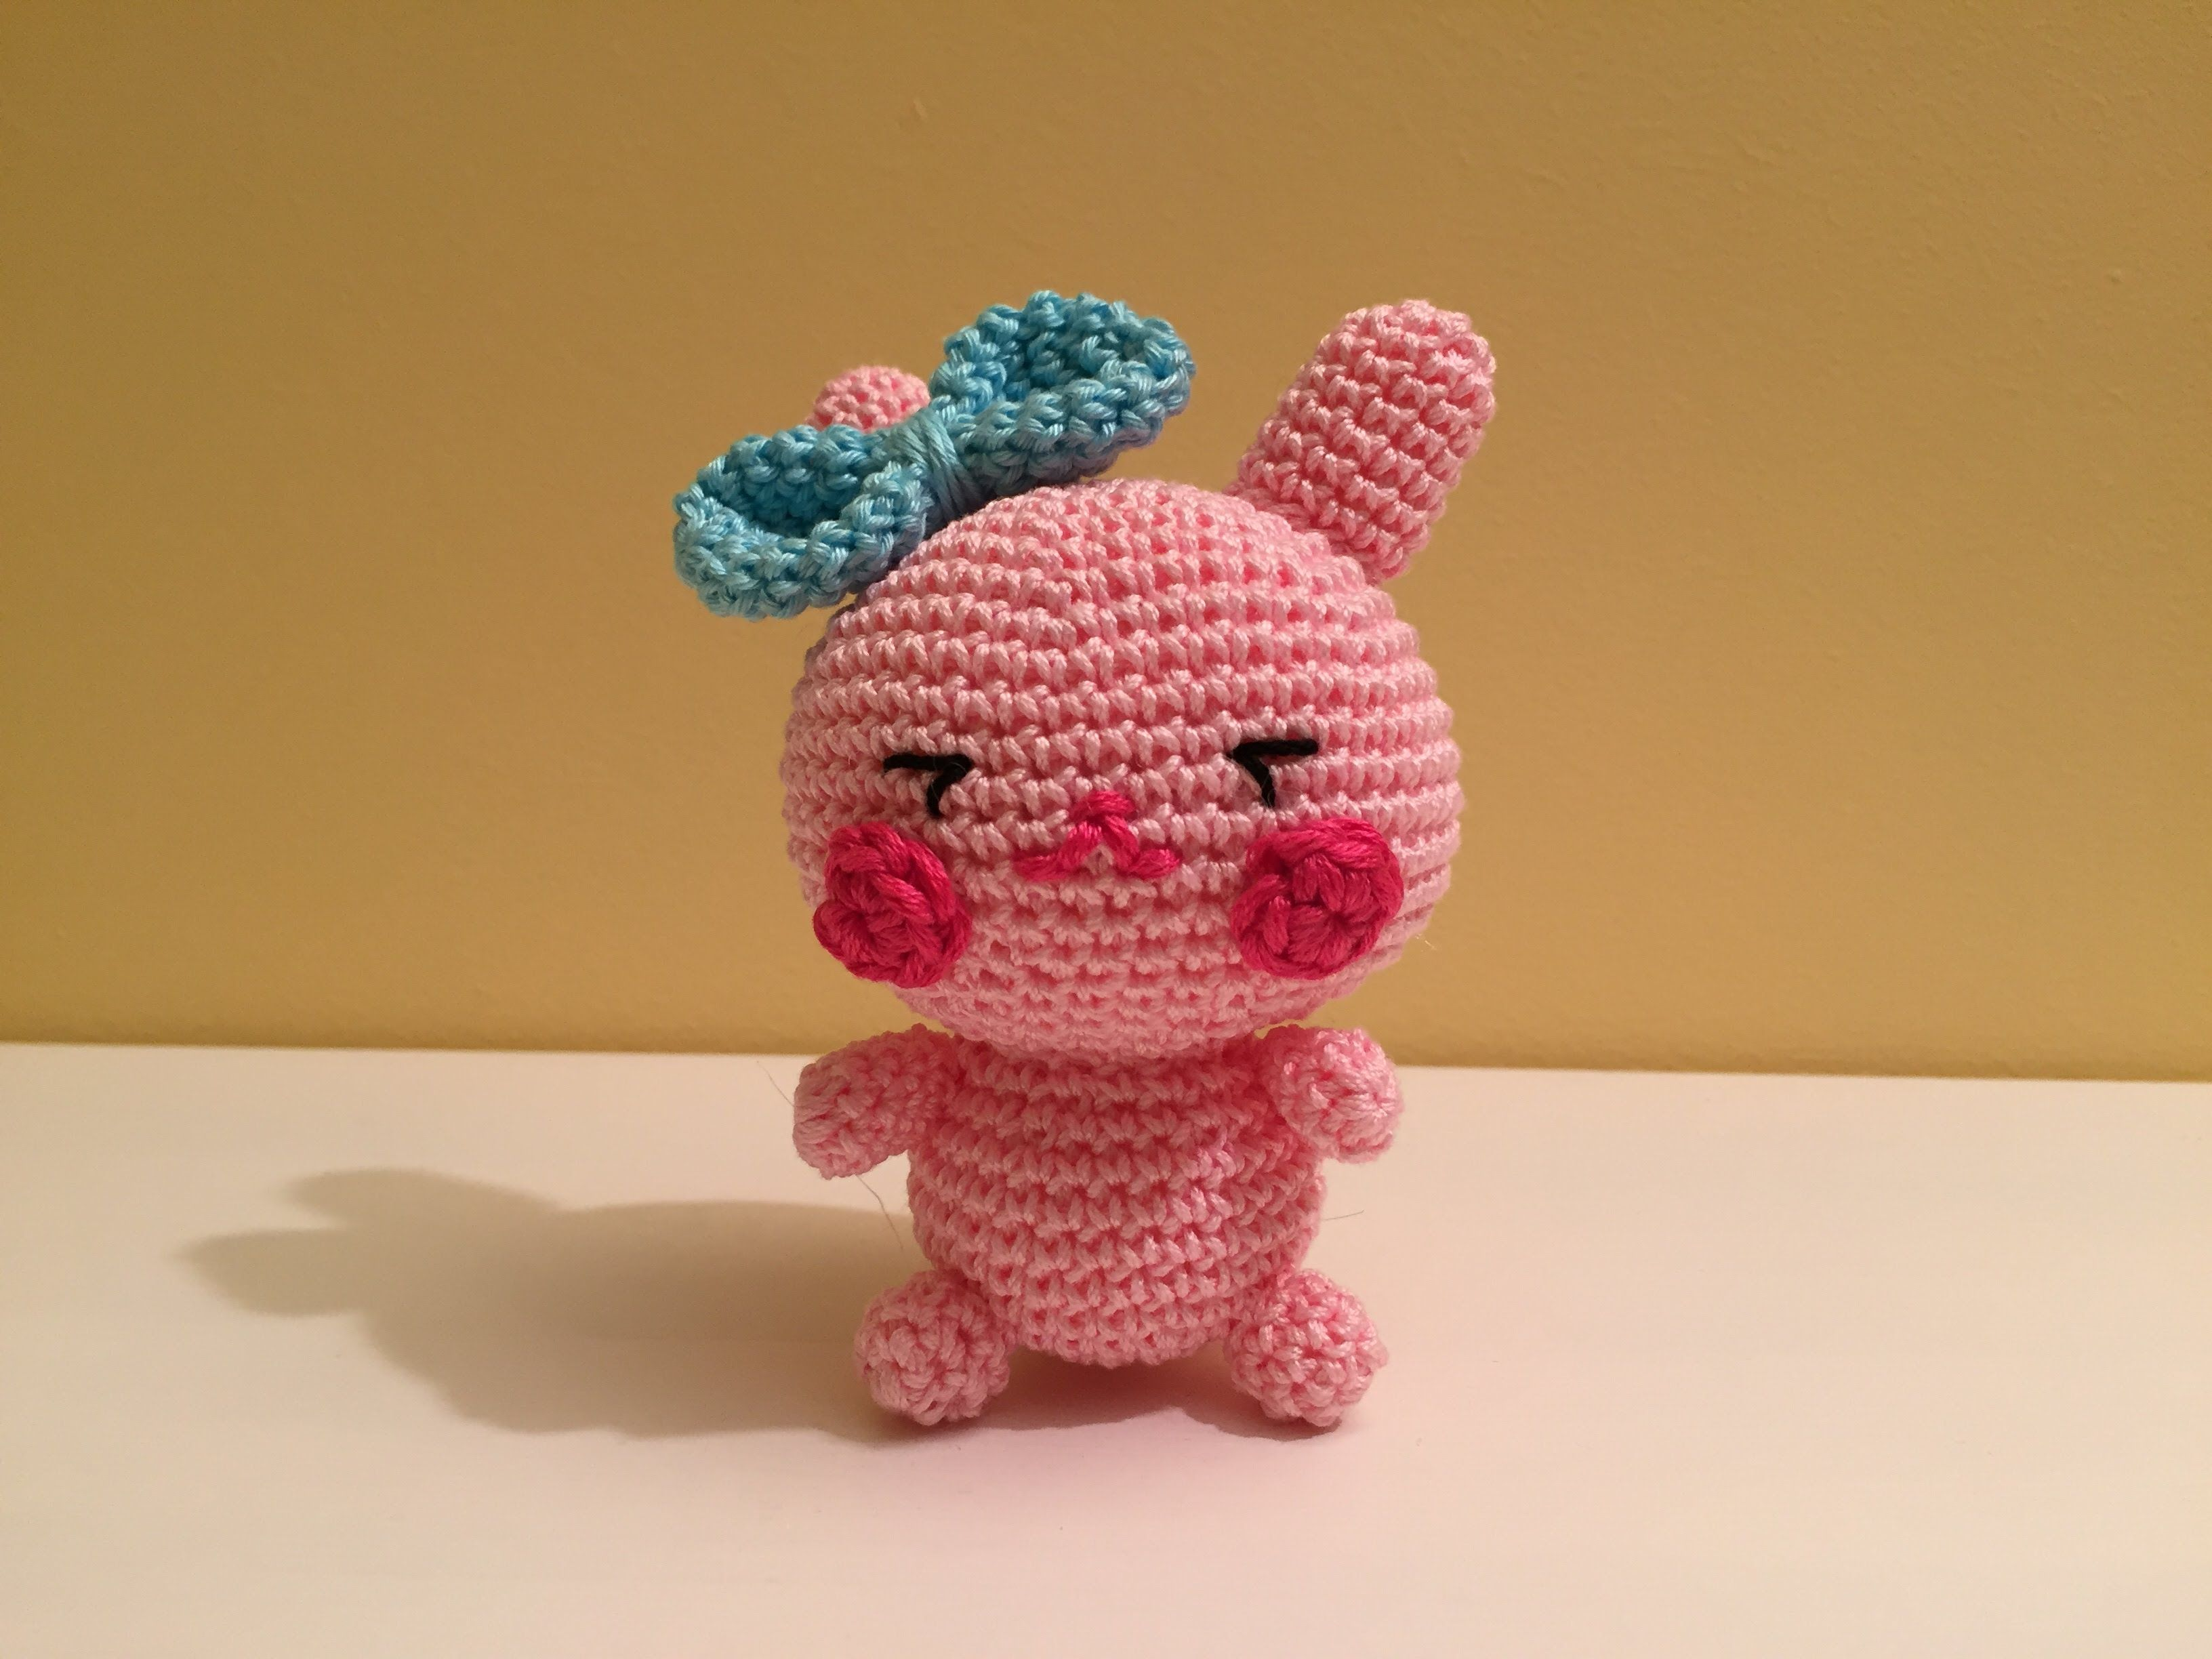 Amigurumi Rabbit Tutorial : Tutorial mini coniglietto amigurumi how to crochet a pink rabbit